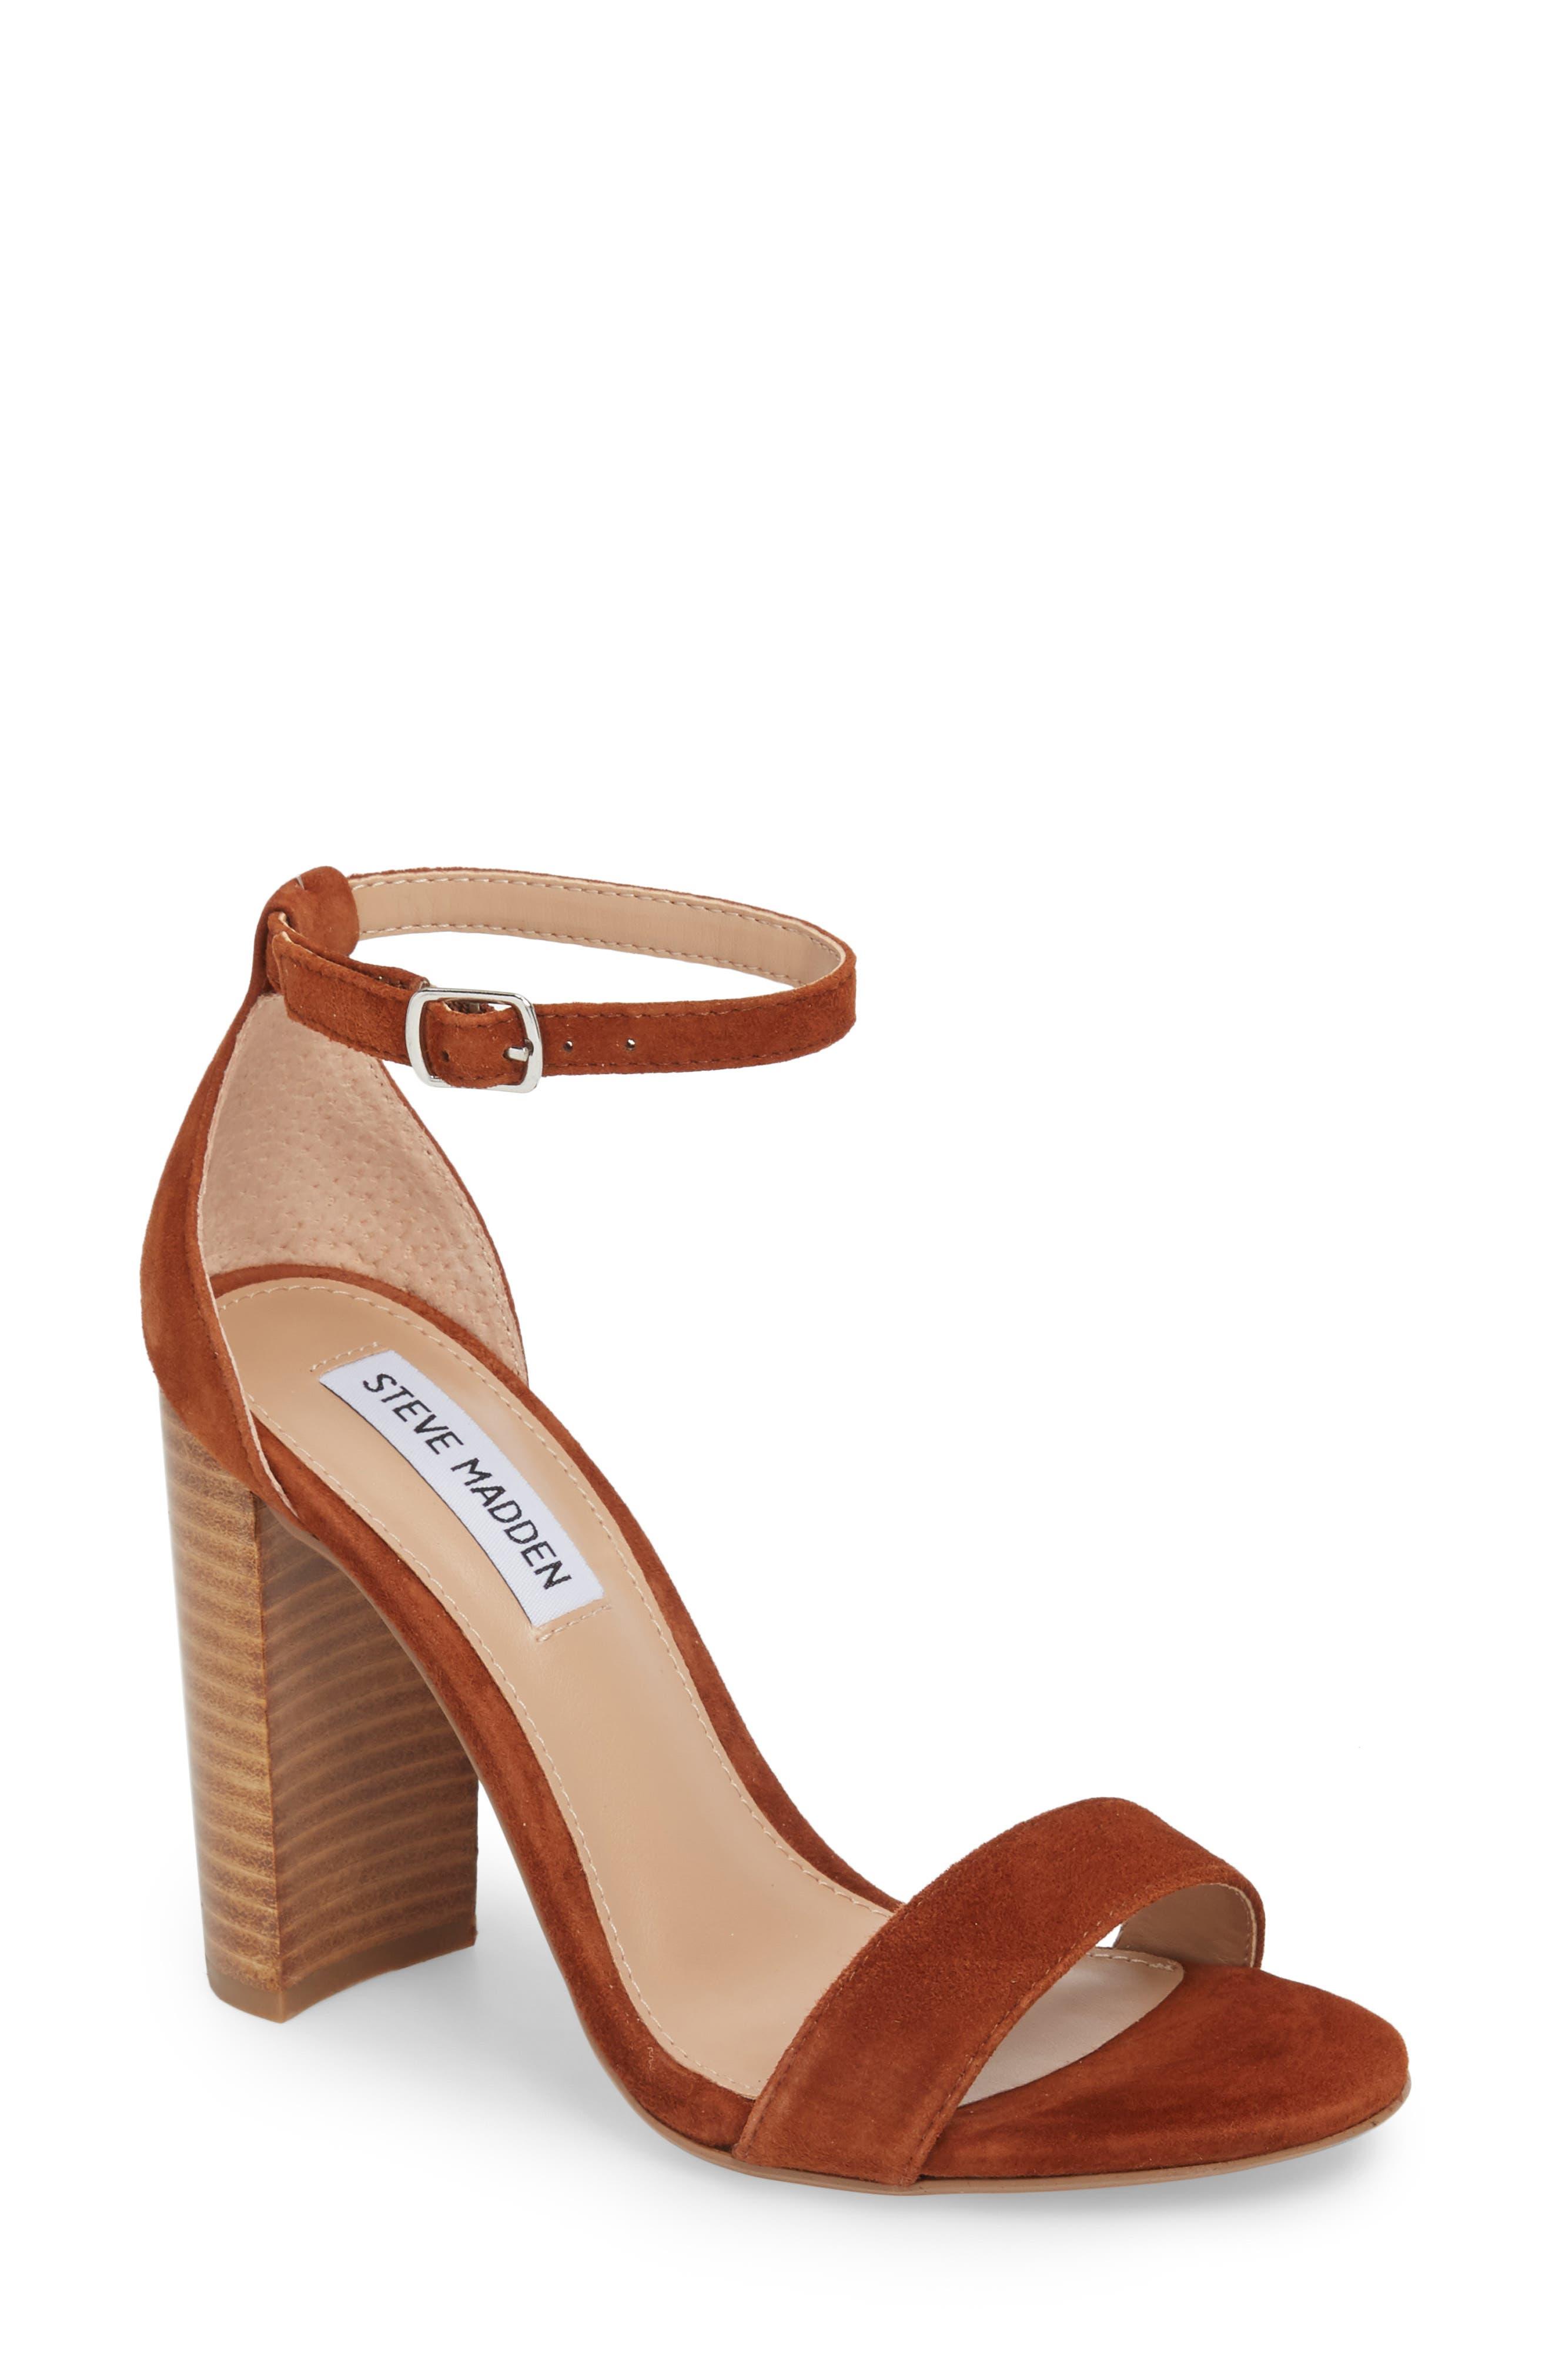 Carrson Sandal,                         Main,                         color, CHESTNUT MULTI